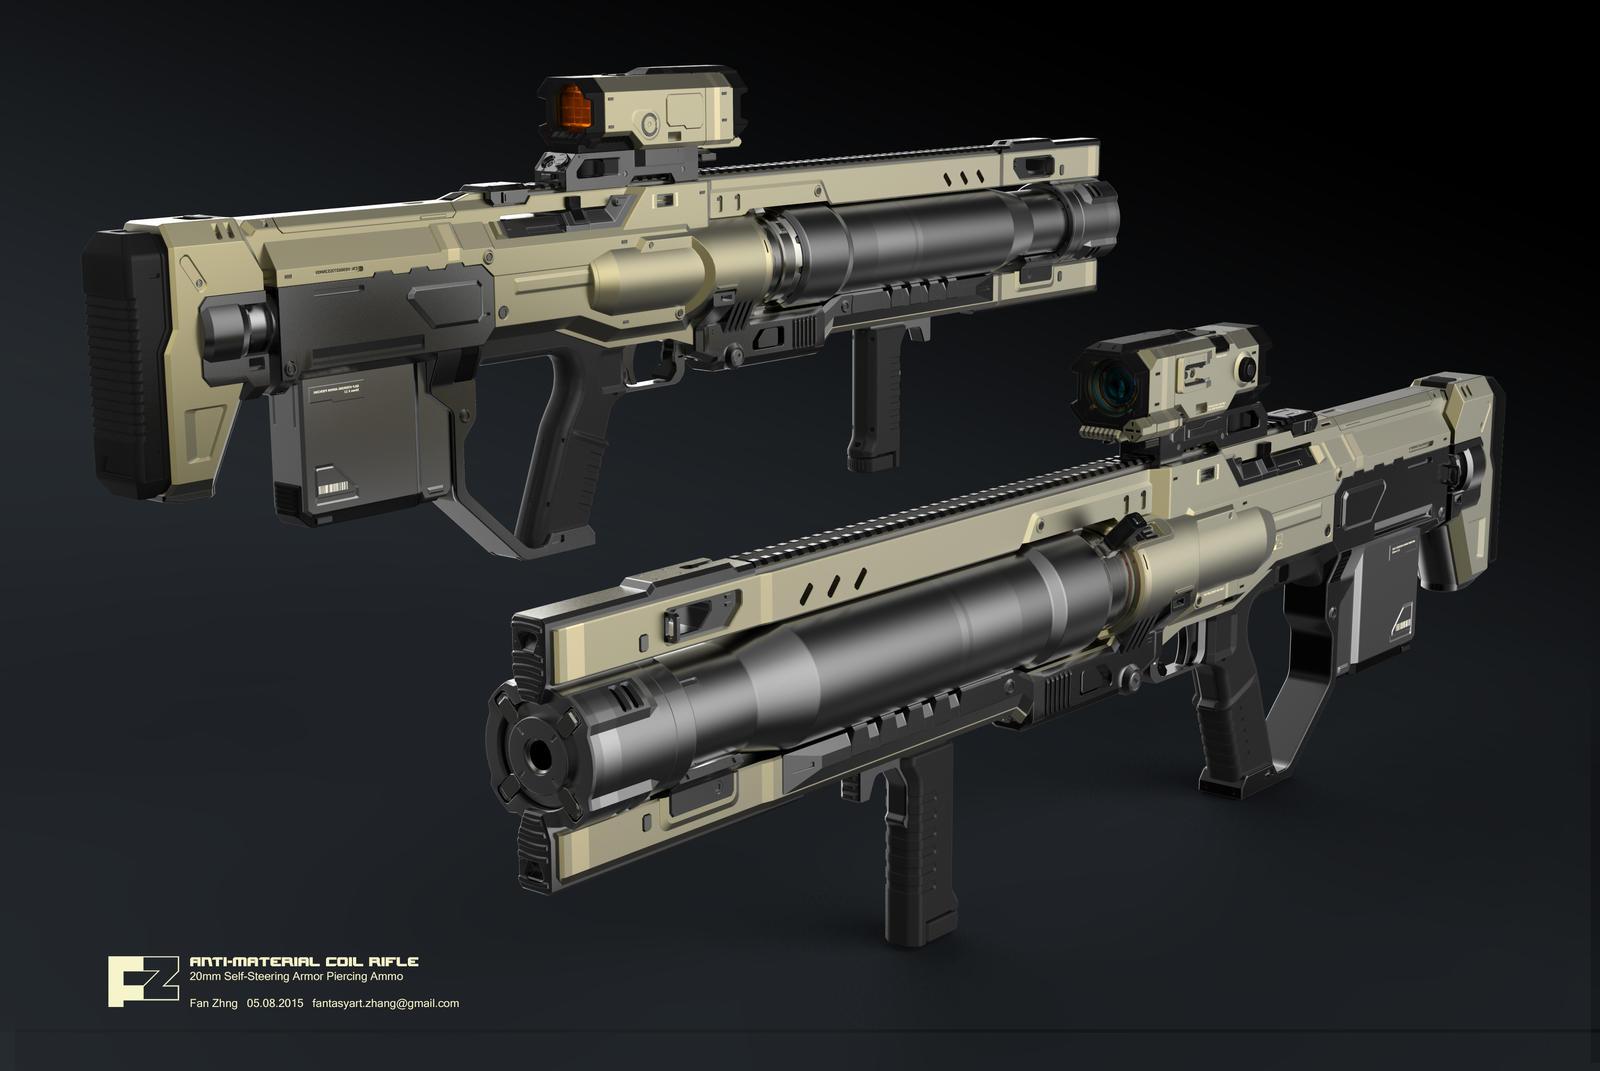 ANTI-MATERIAL COIL GUN